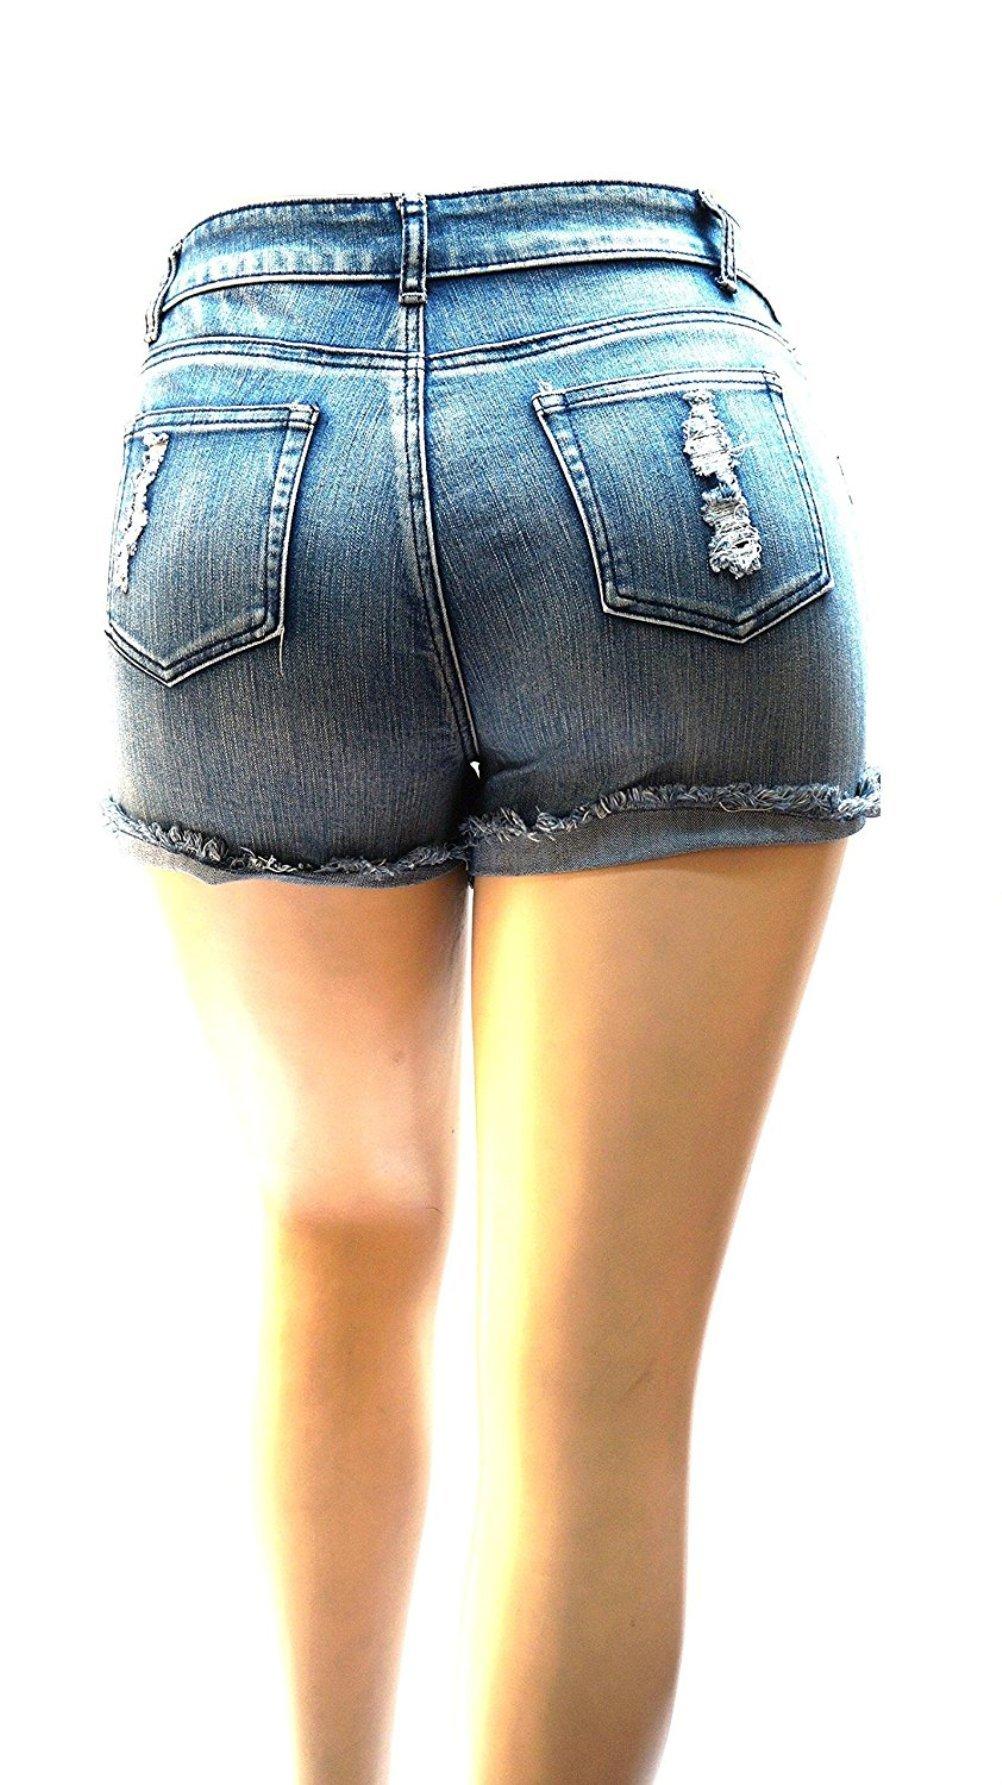 55cd152d52 Diamante Zenobia   1826 Womens Plus Size Short Stretch Distressed Ripped  Blue Denim Jeans Shorts